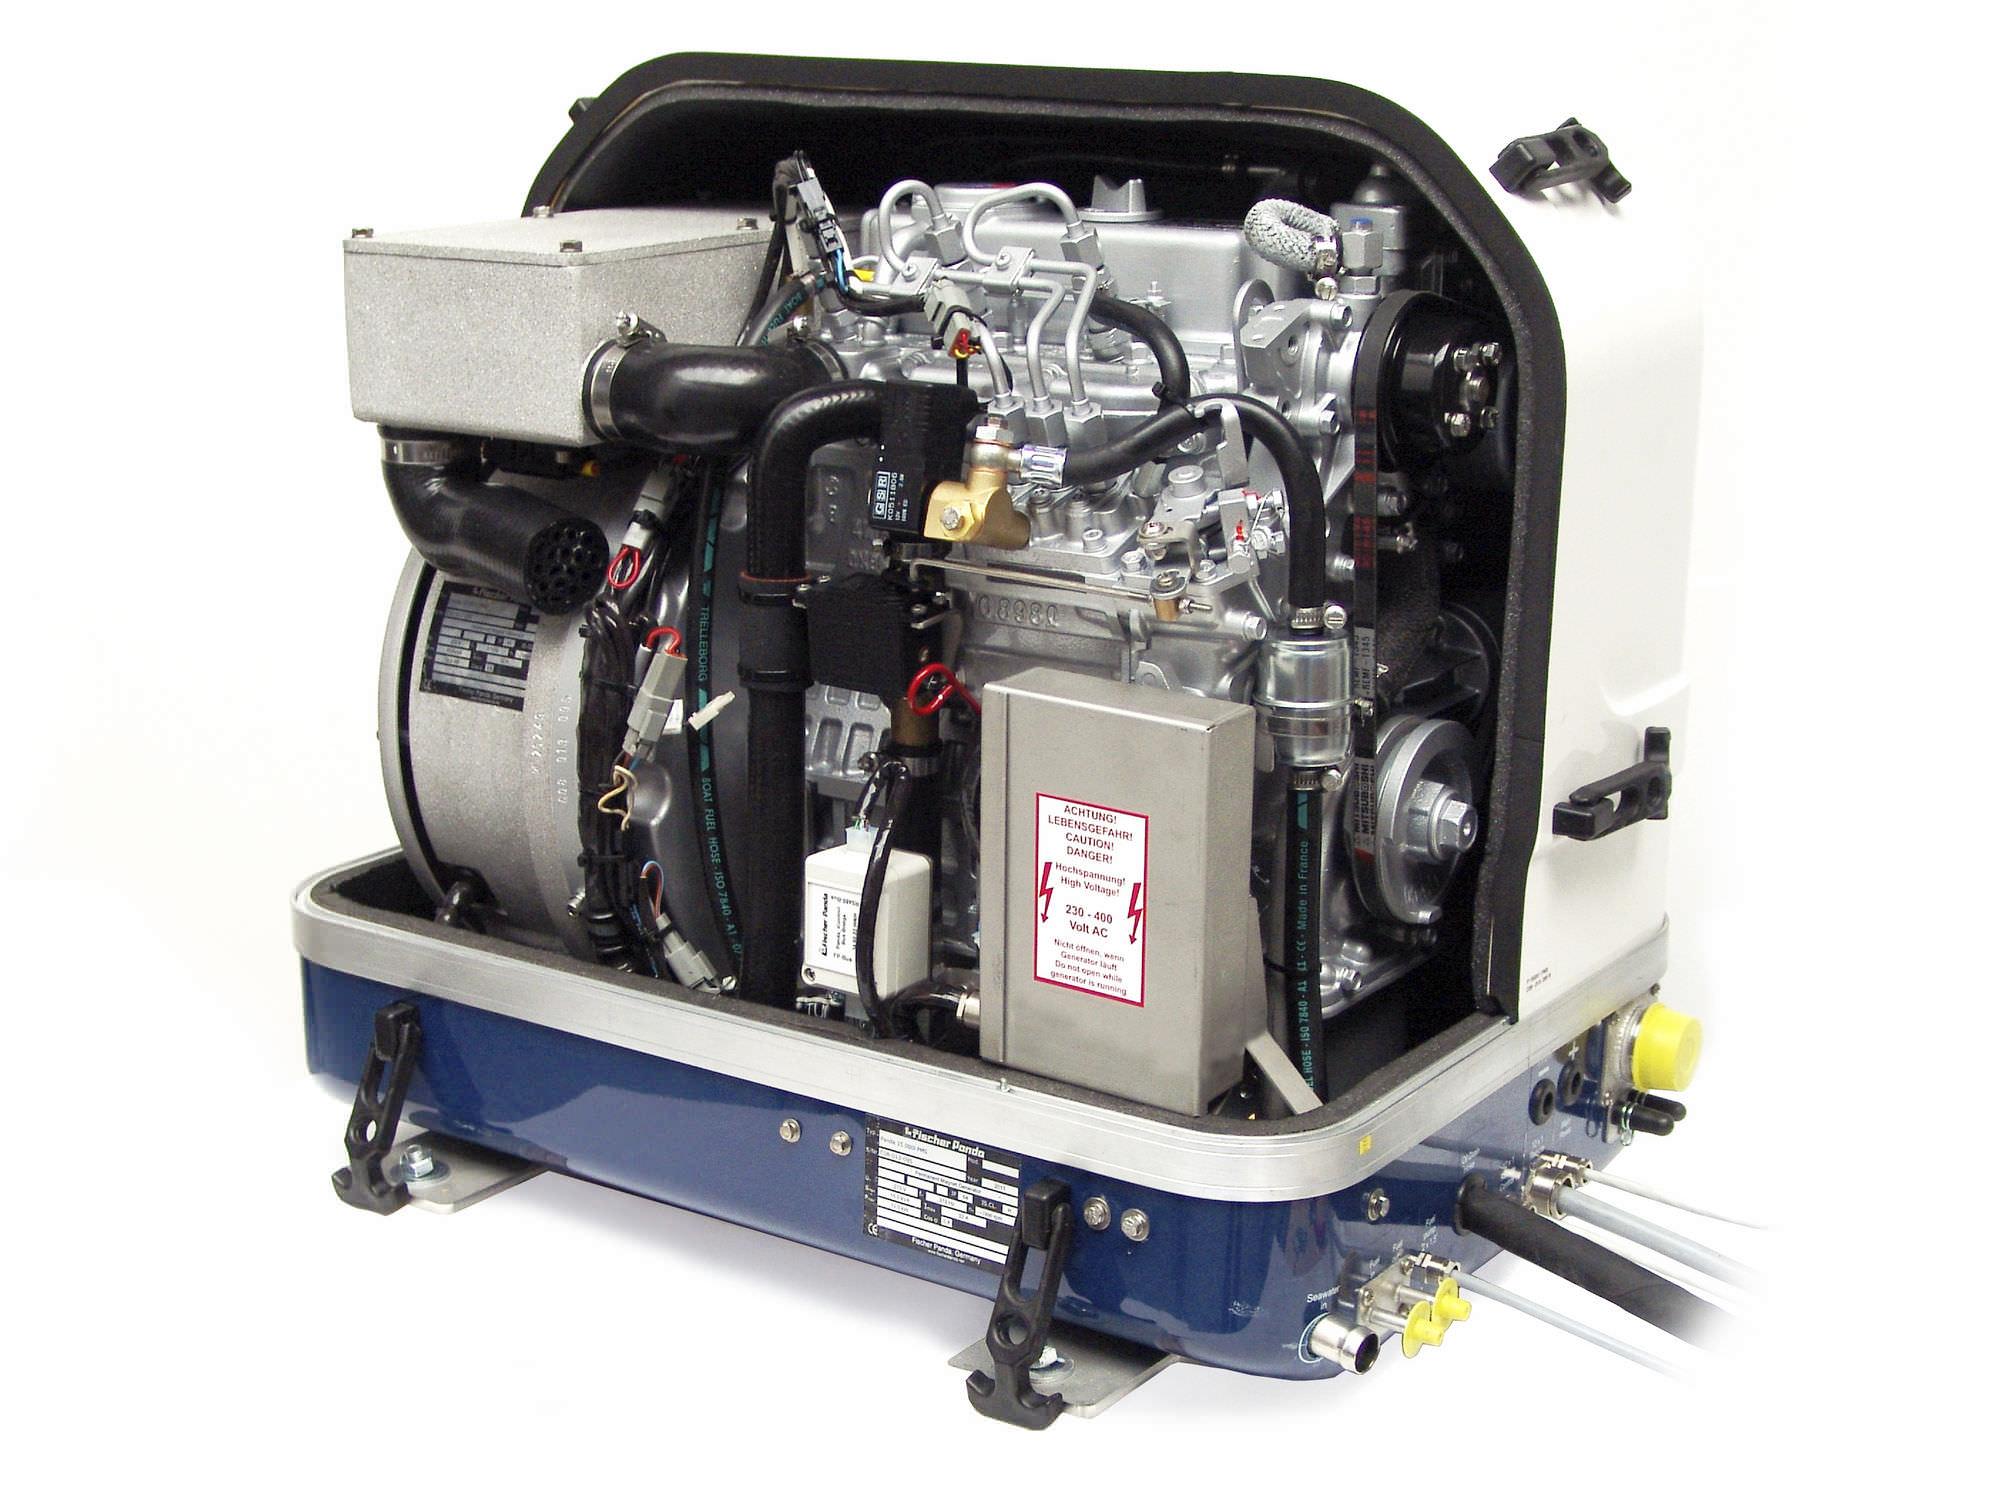 Boat generator set sel with alternator PANDA i PMS